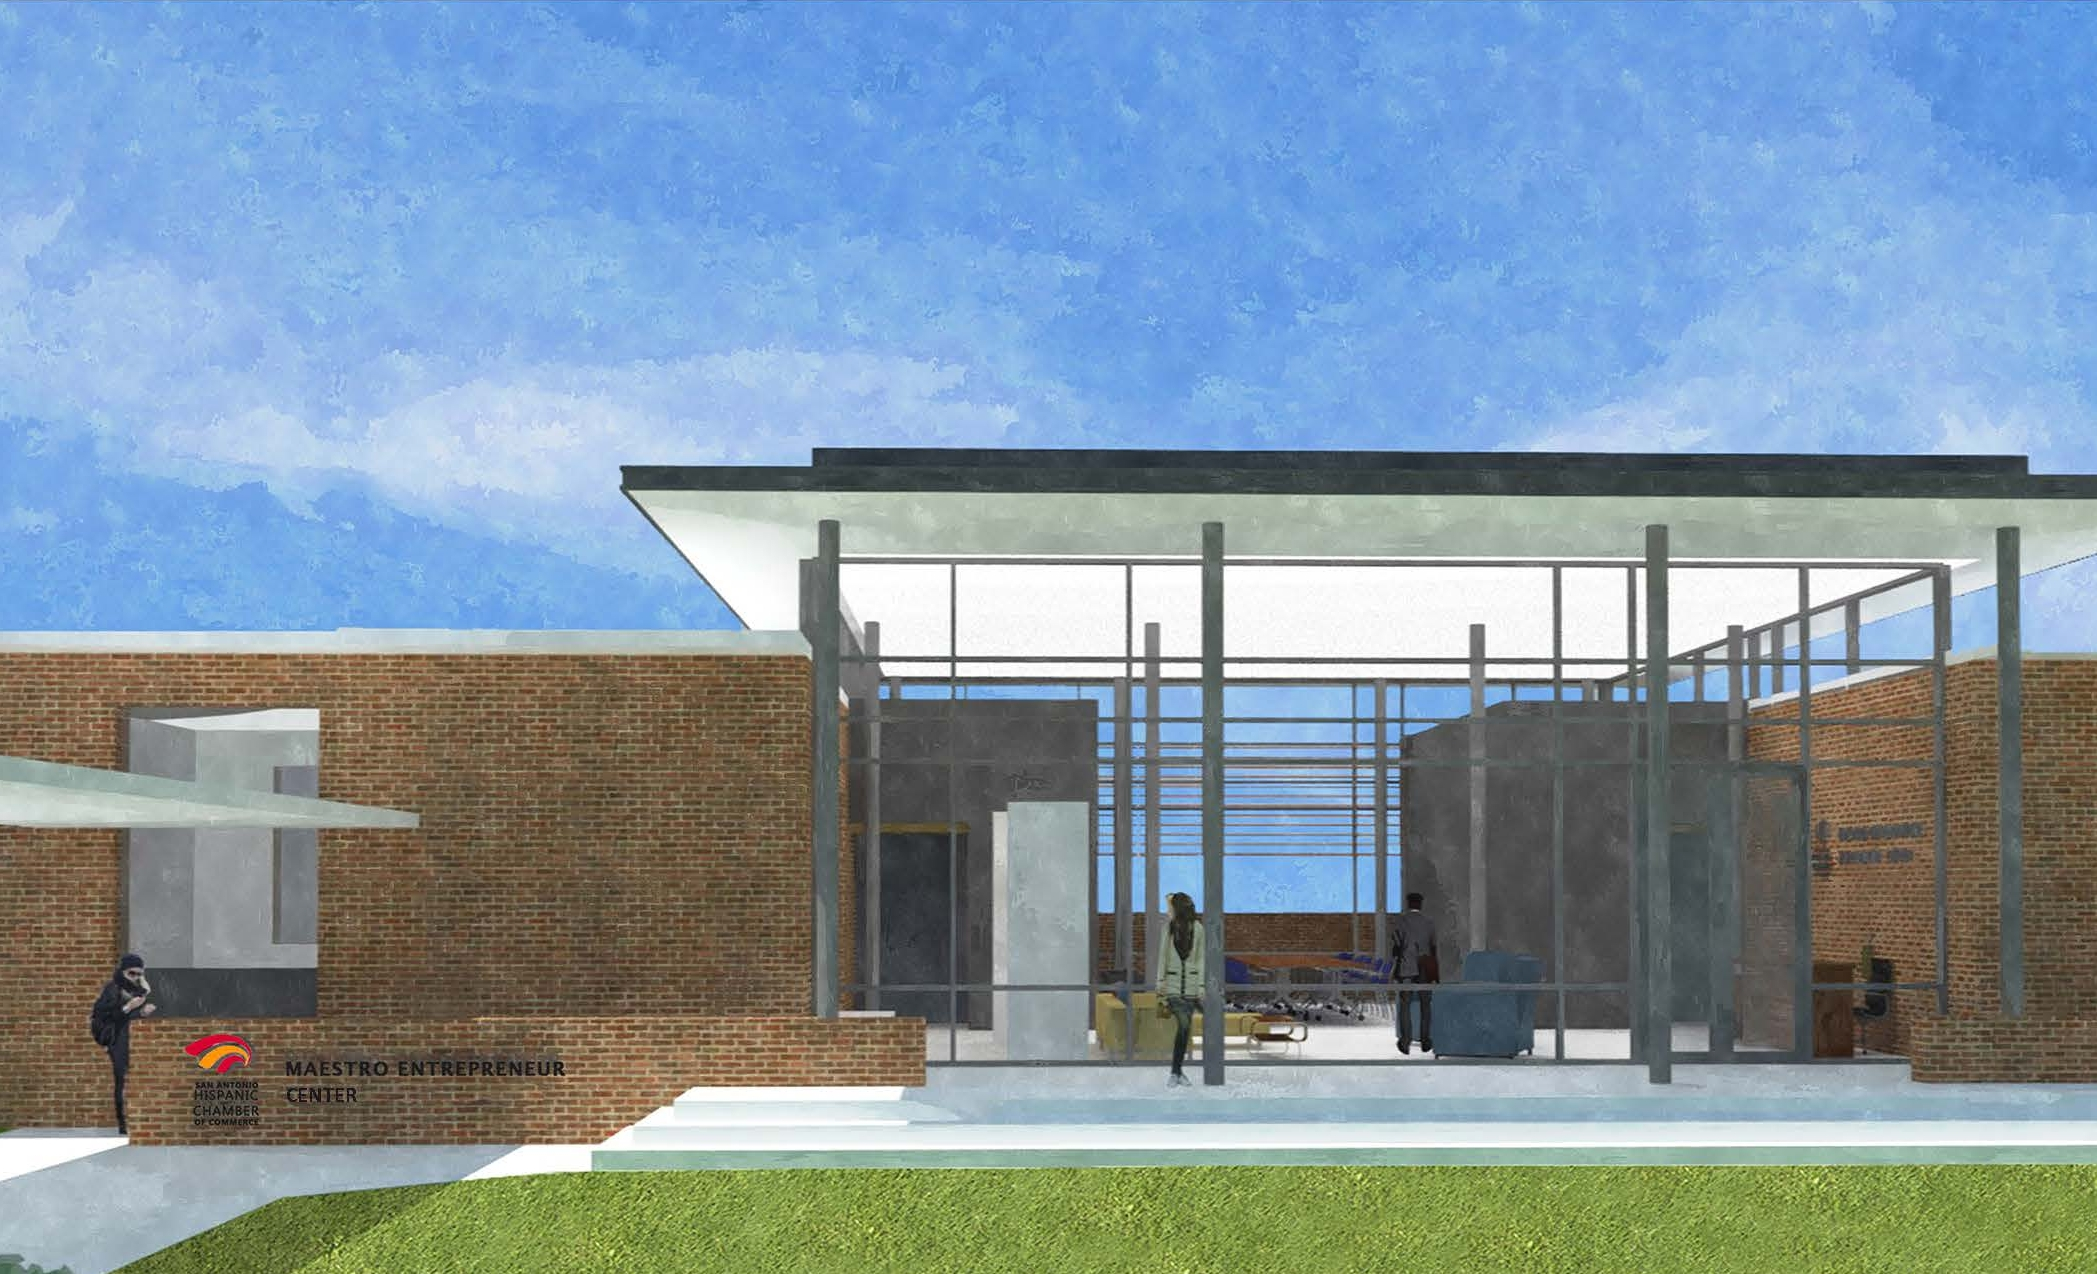 Maestro Entrepreneur Center - 1811 S. Laredo St.San Antonio, TX 78207